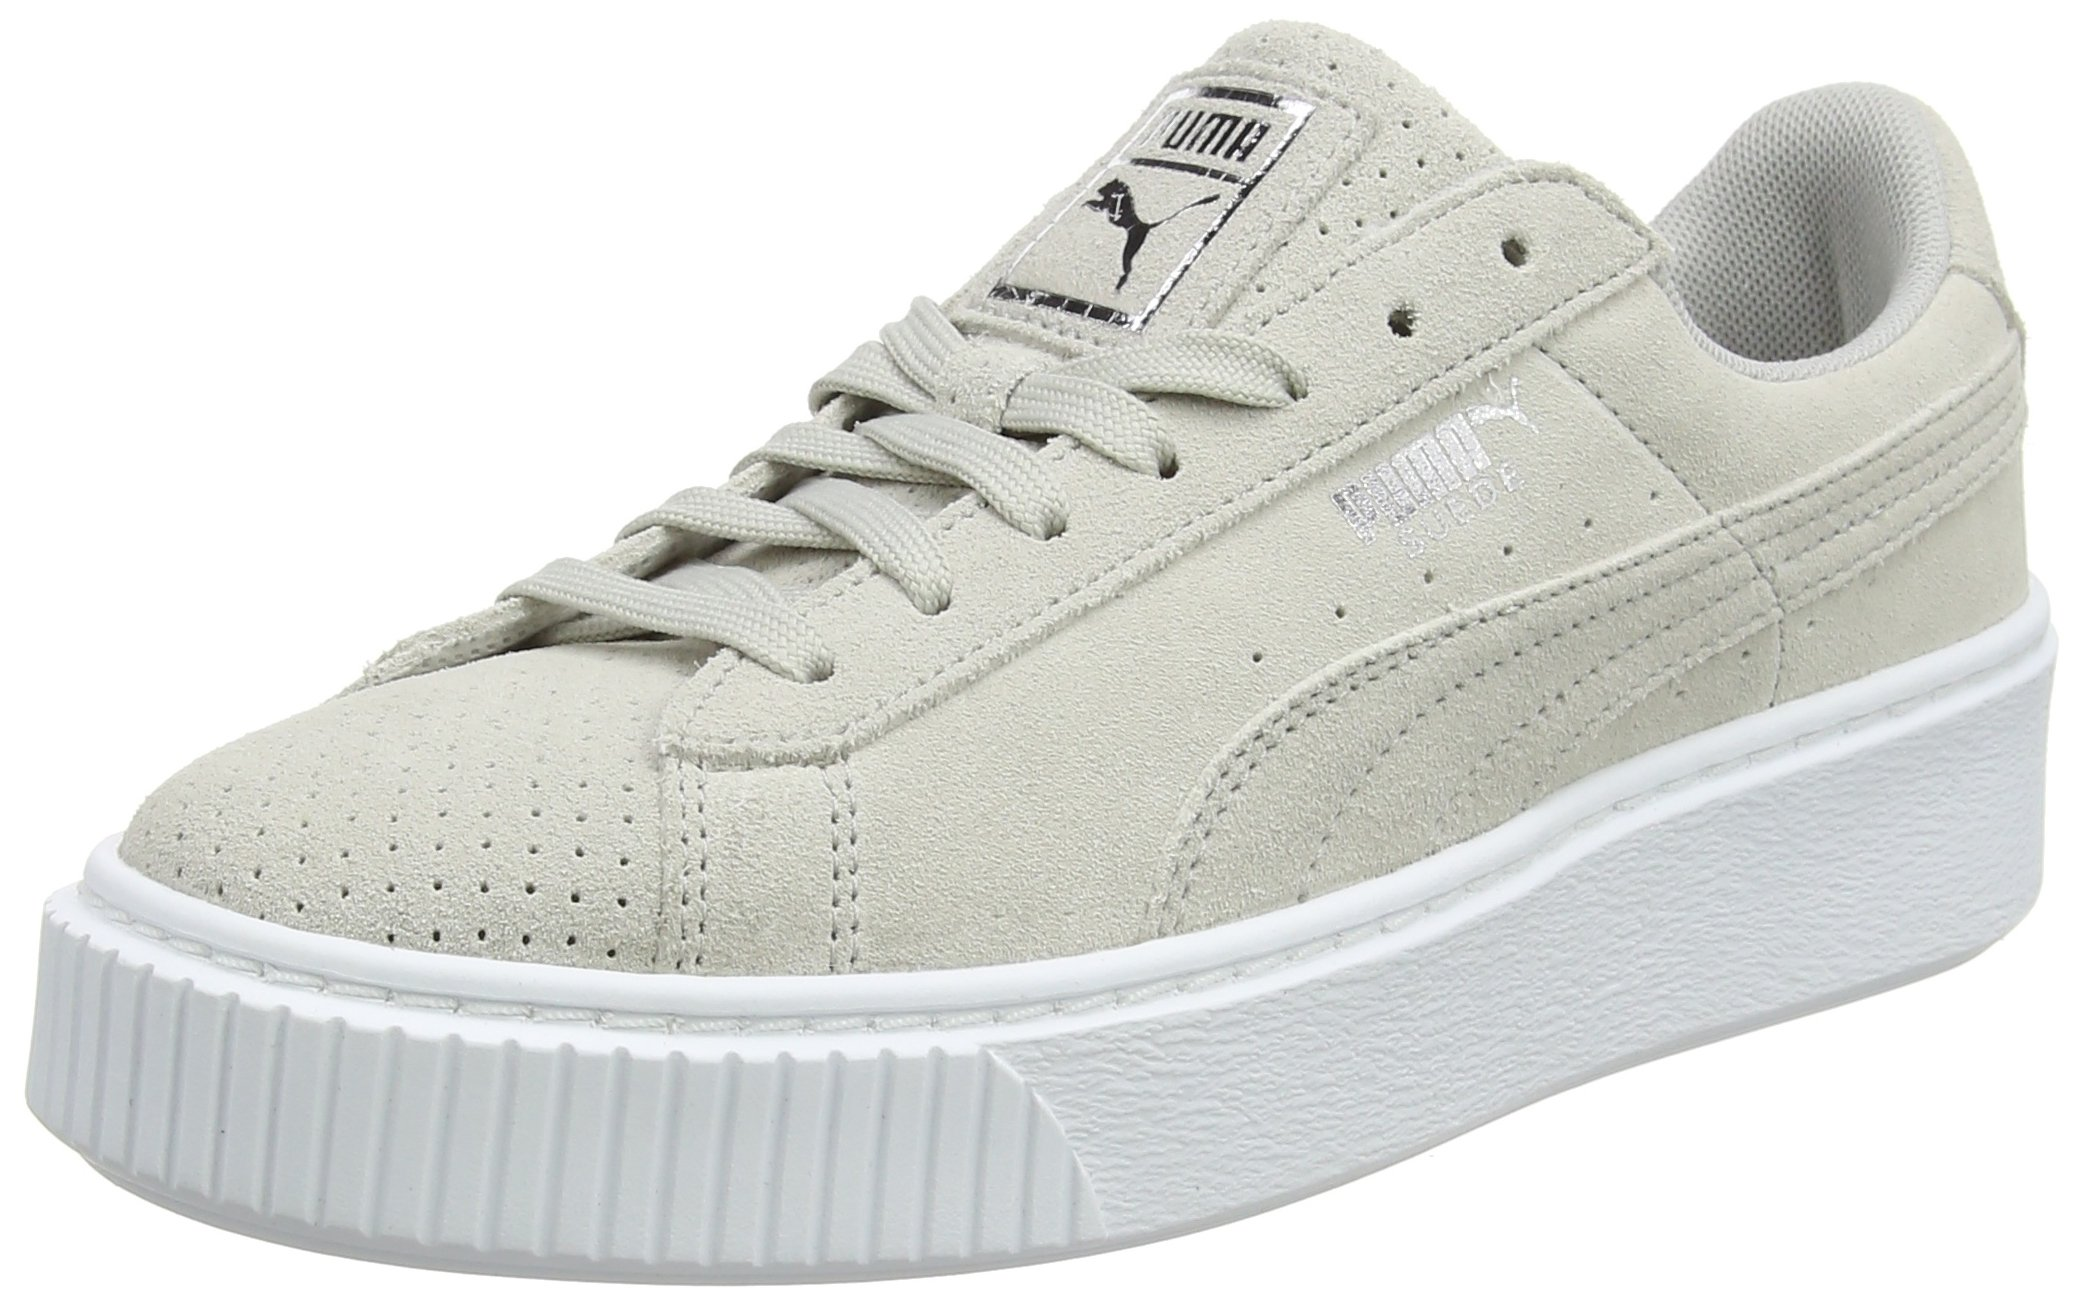 Puma Sneaker grau silber, 39